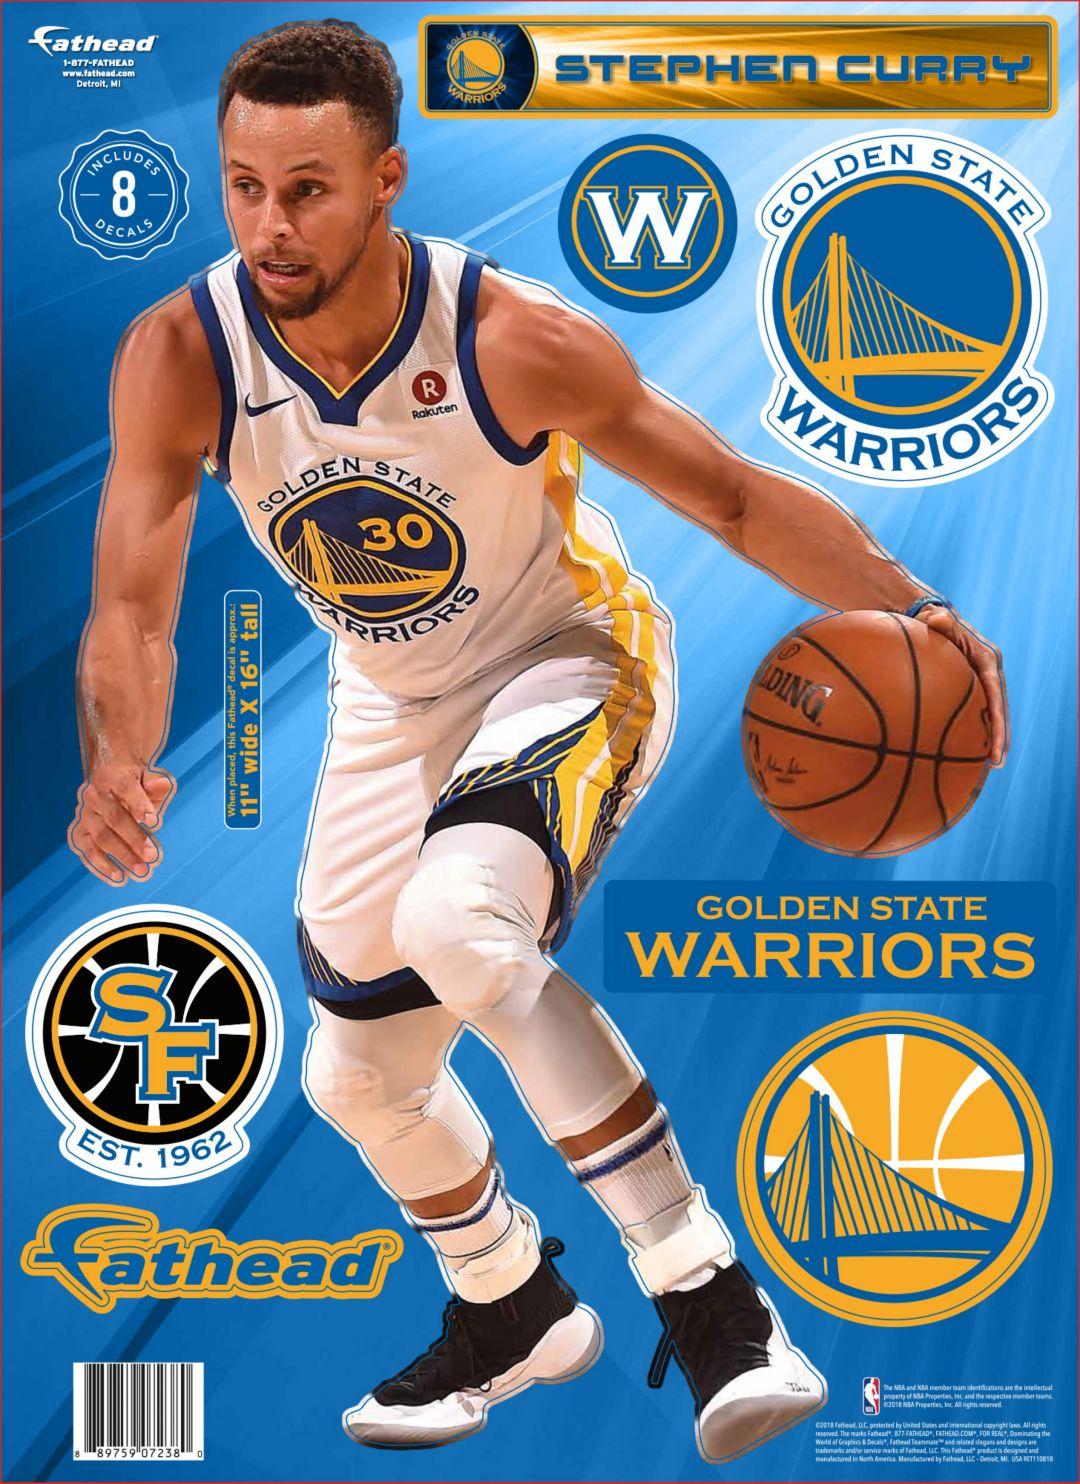 9816b7e0a20d Fathead Golden State Warriors Stephen Curry Wall Decal 1